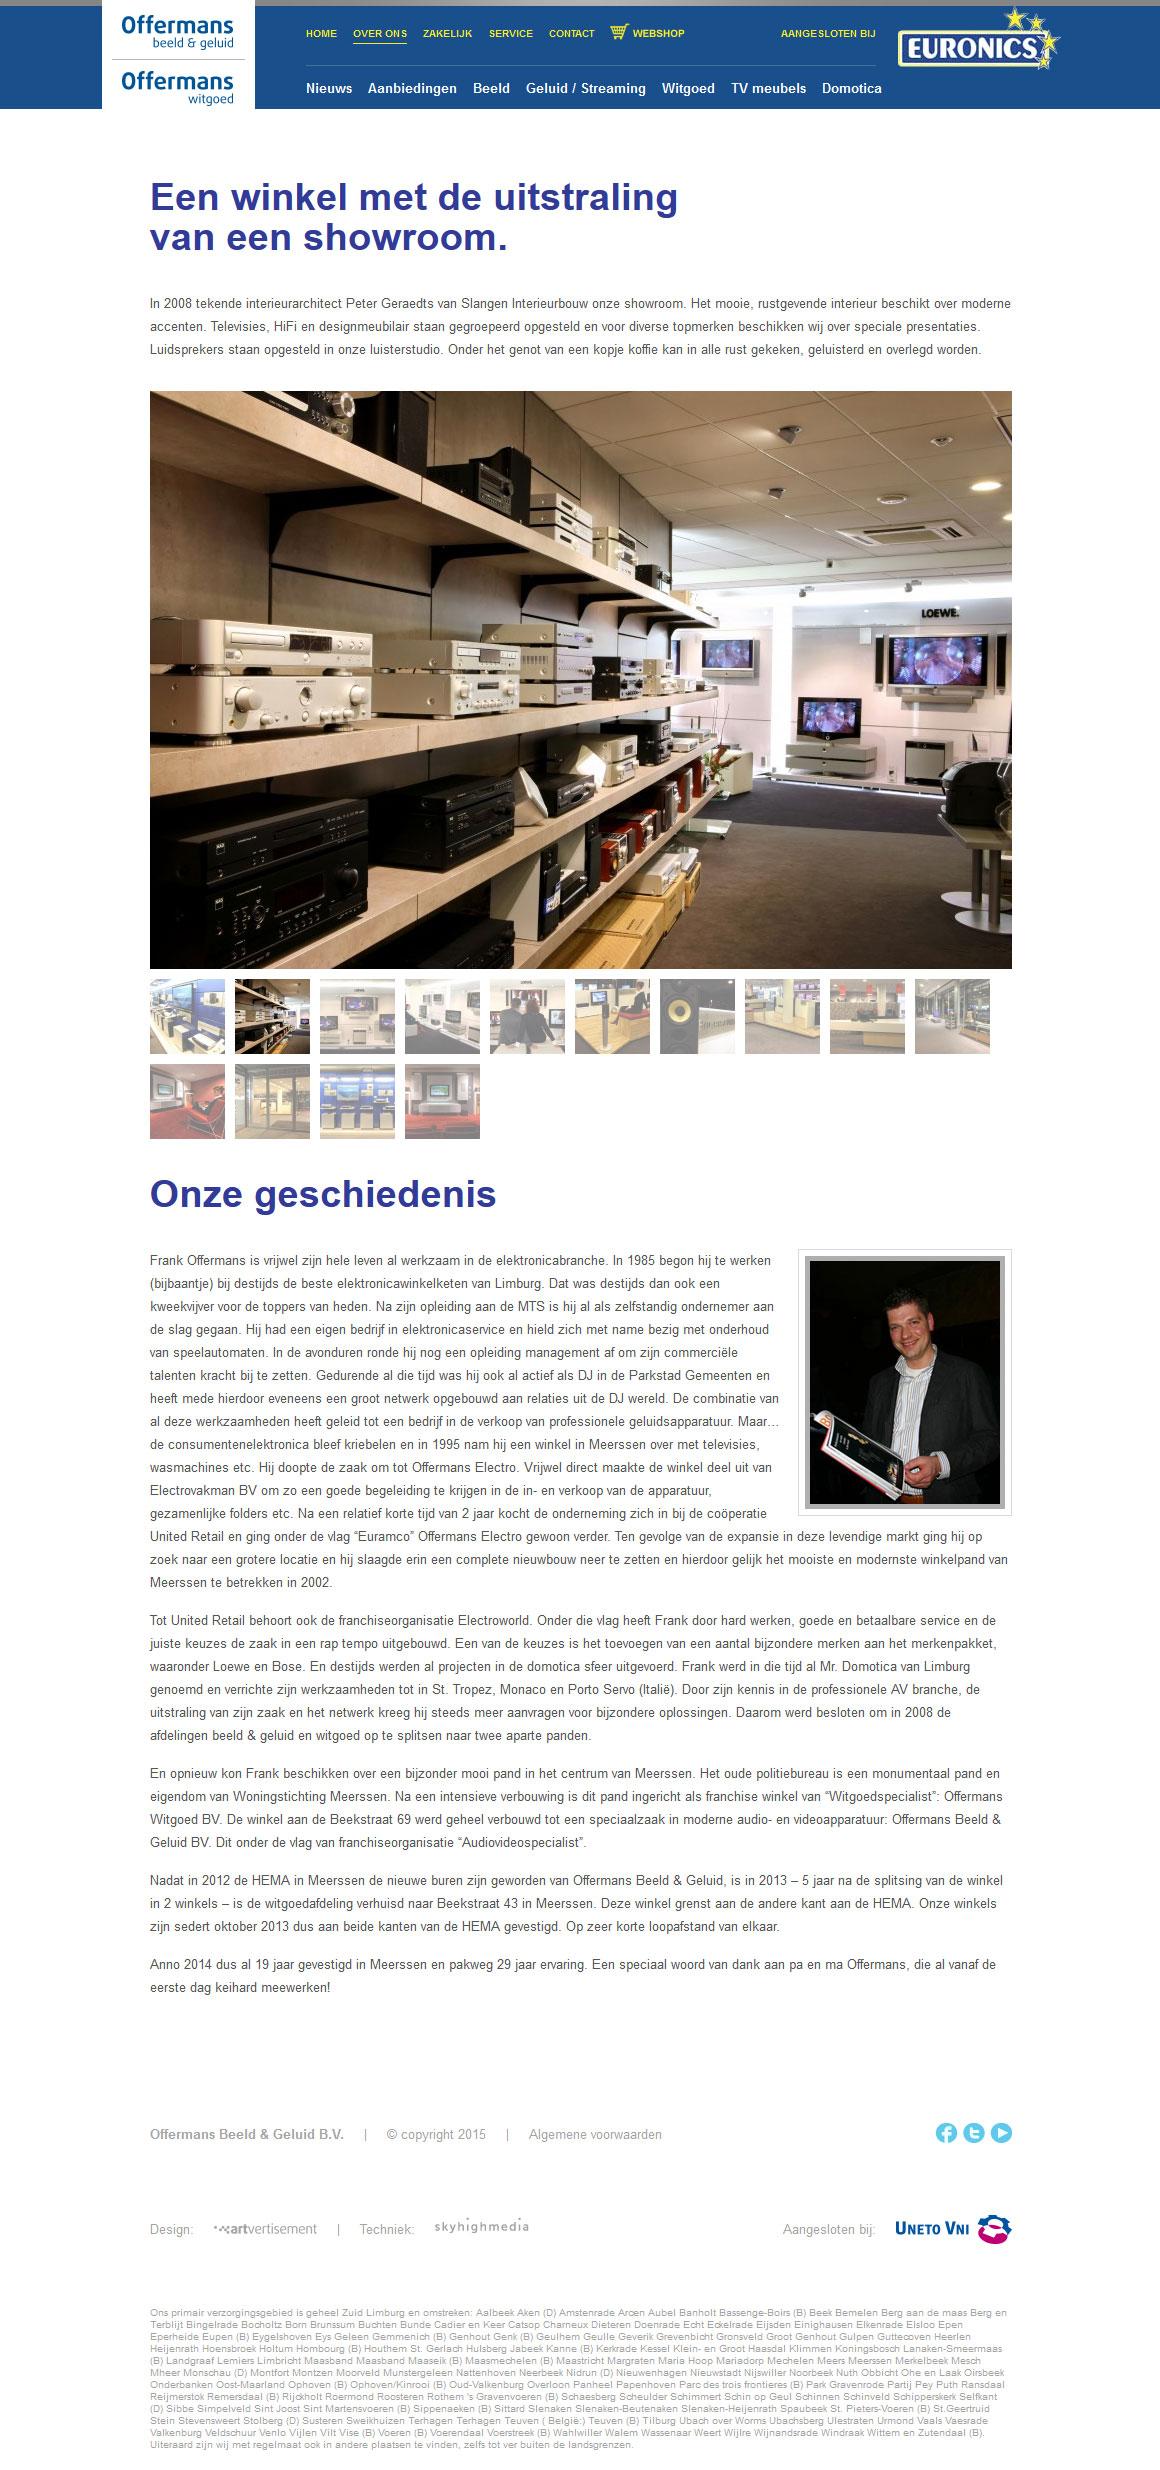 offermans_website2